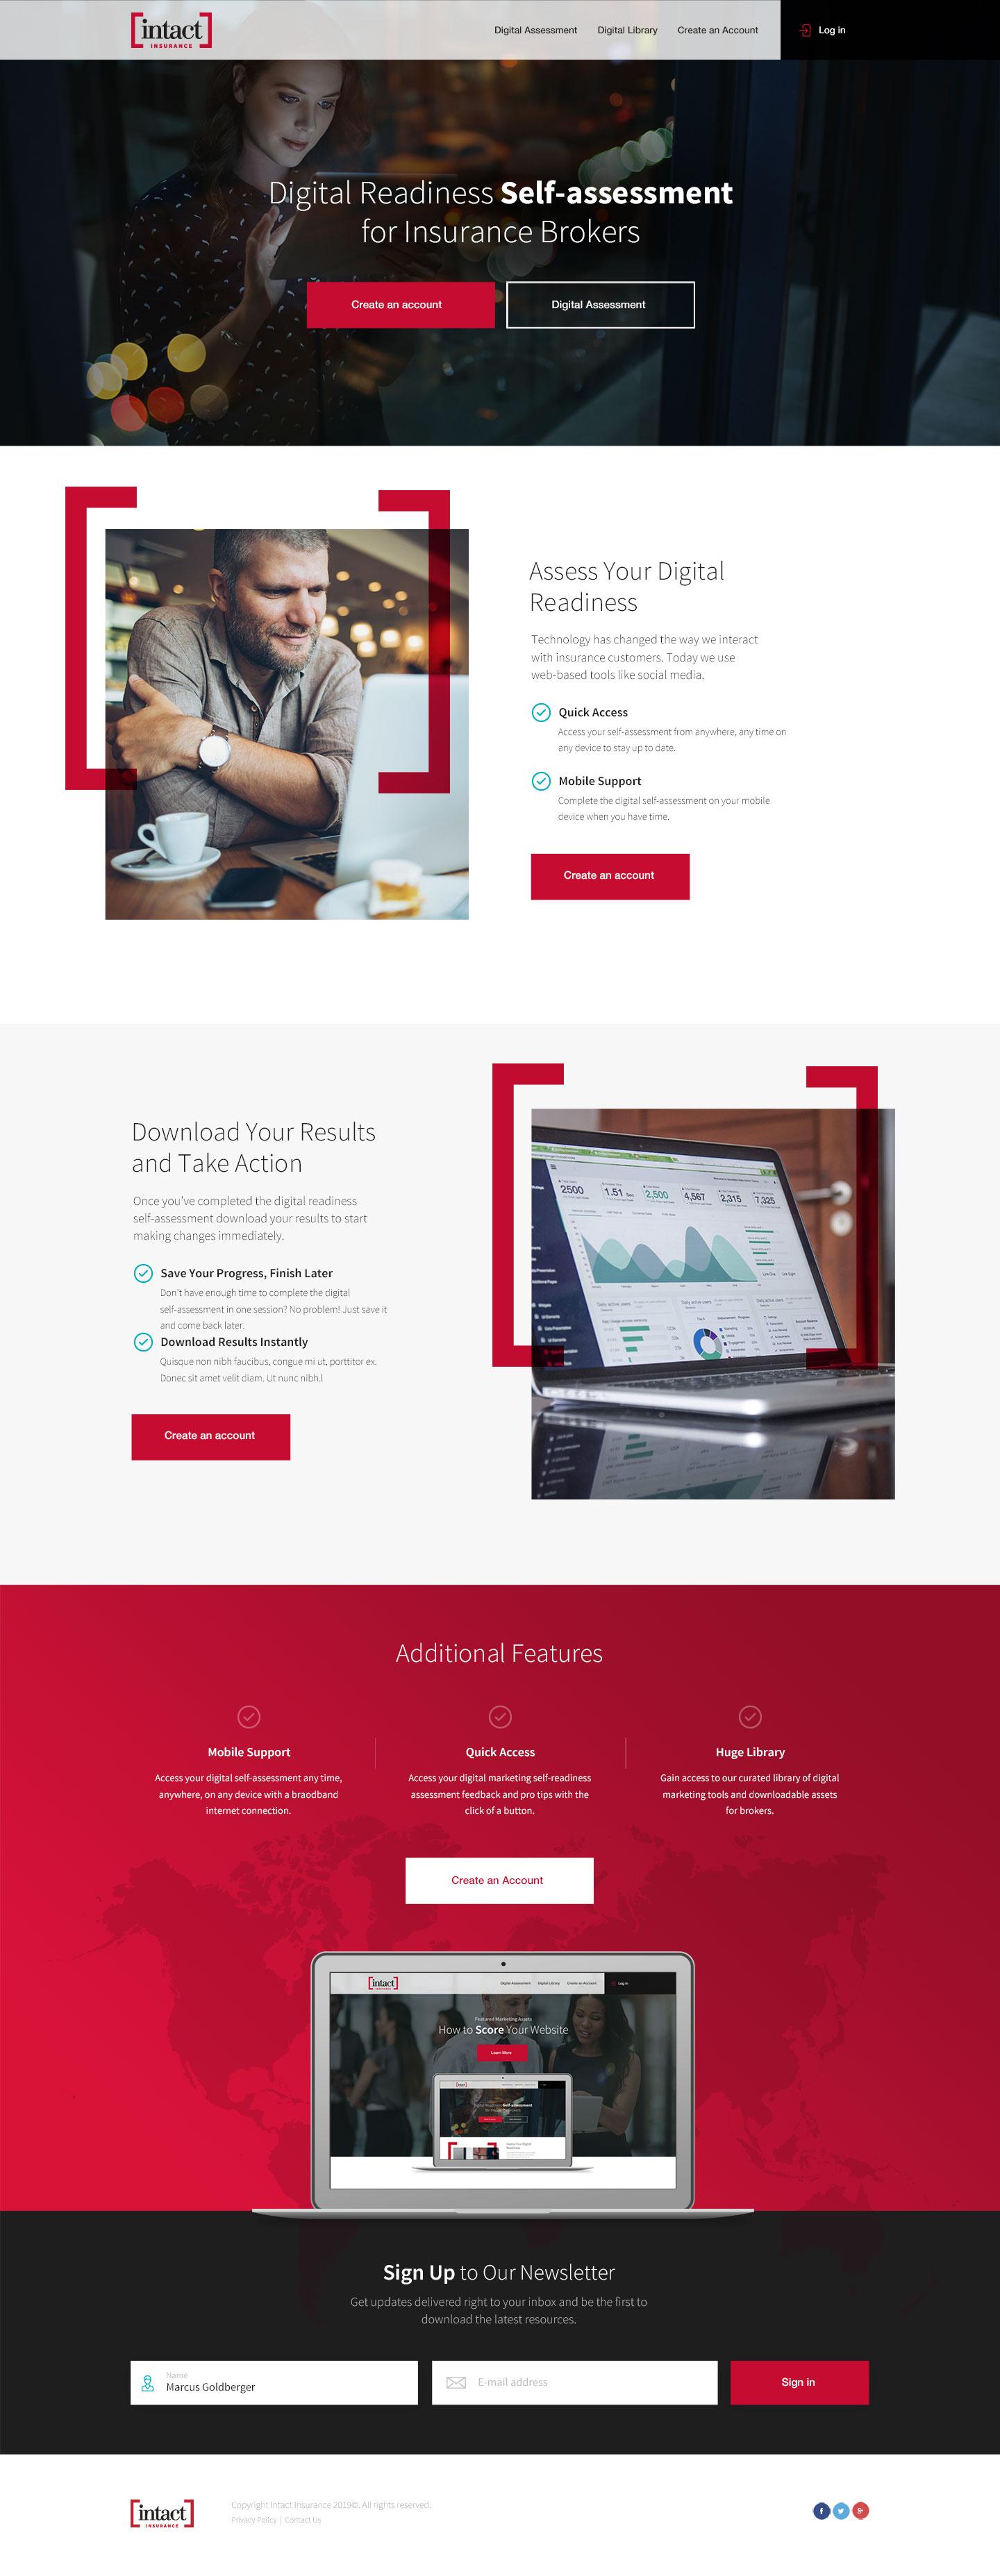 Website Design for Intact Insurance